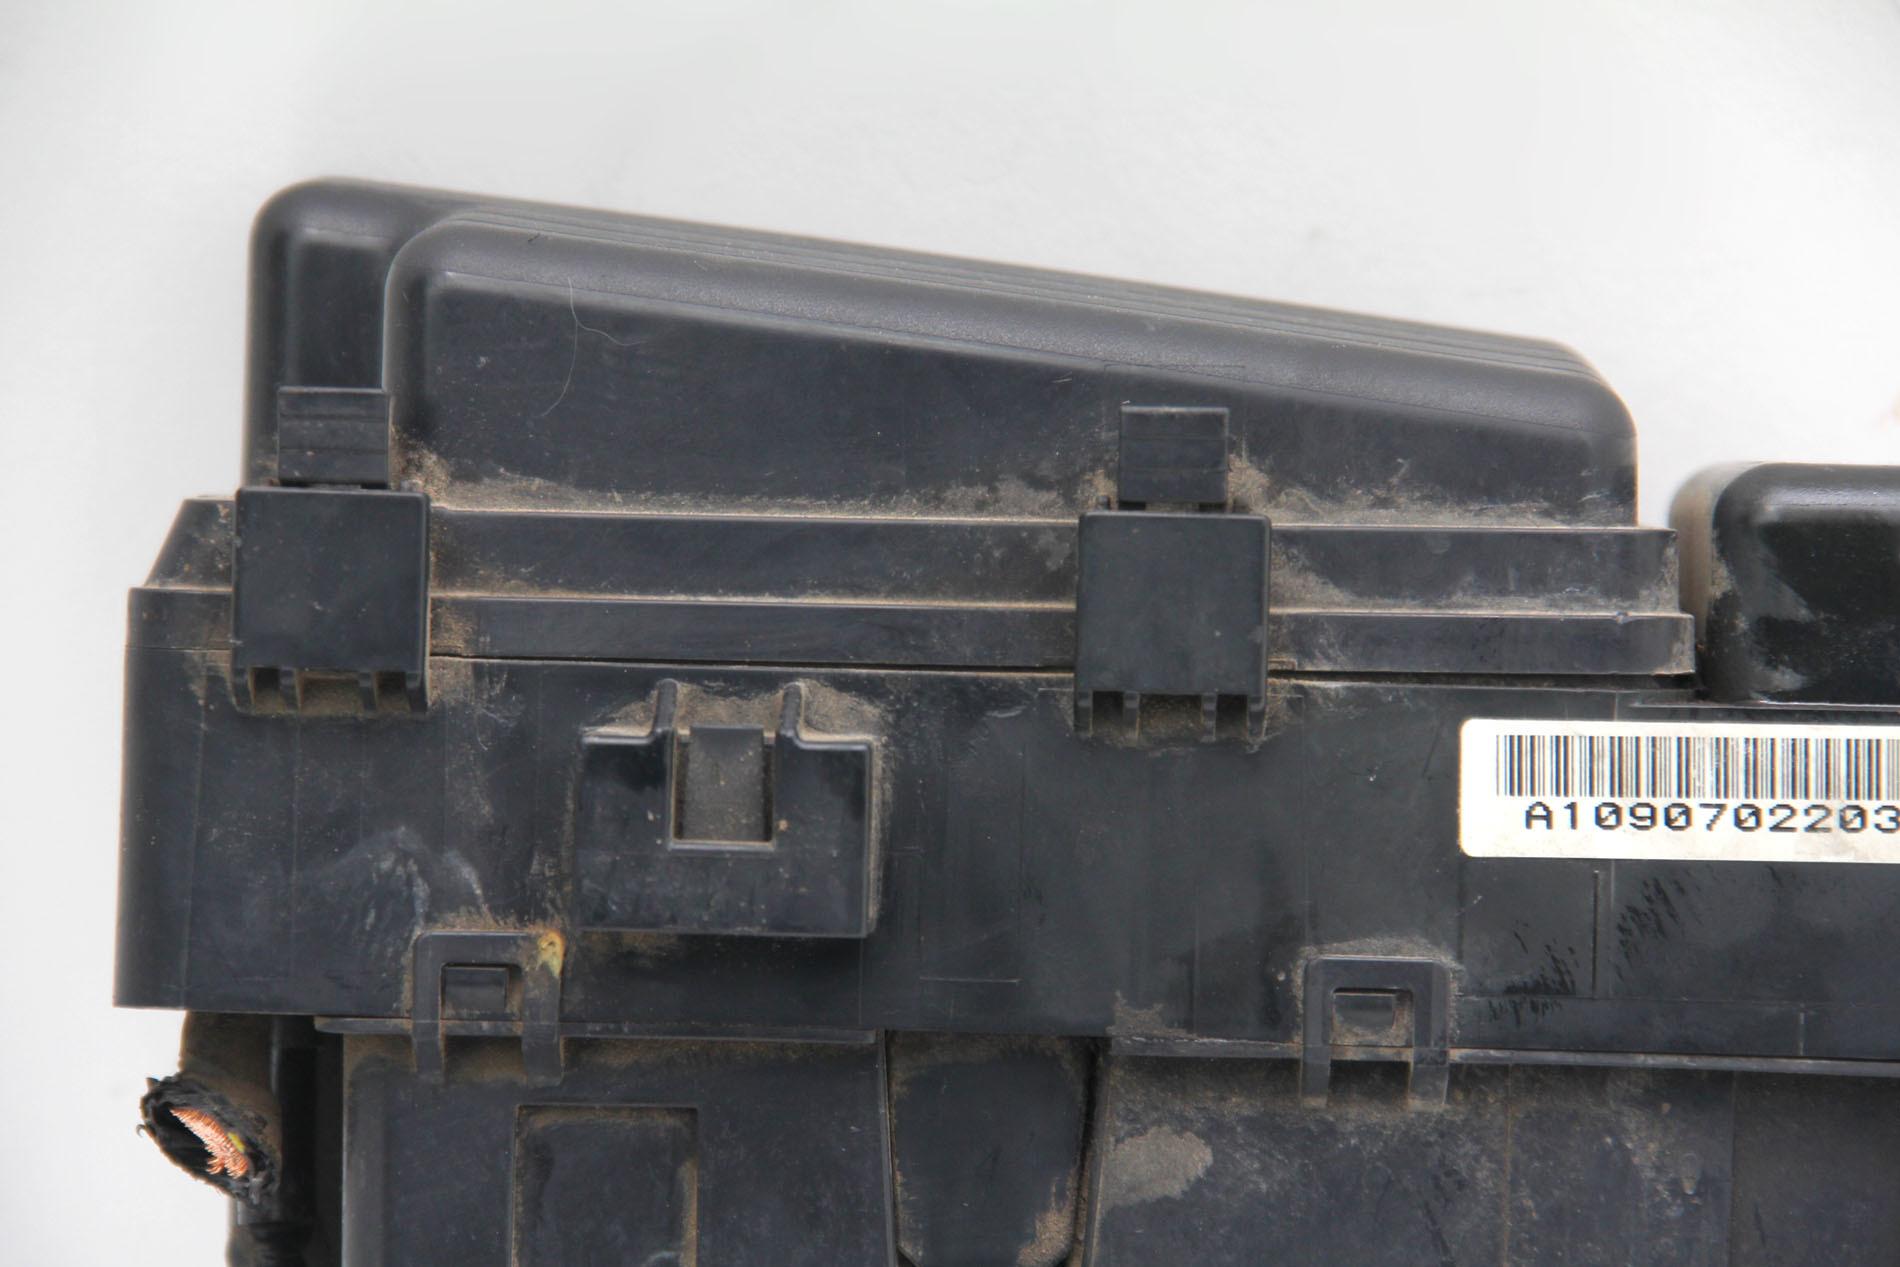 honda ridgeline exterior under hood fuse box 38250-sjc-a12 oem 06 07 08